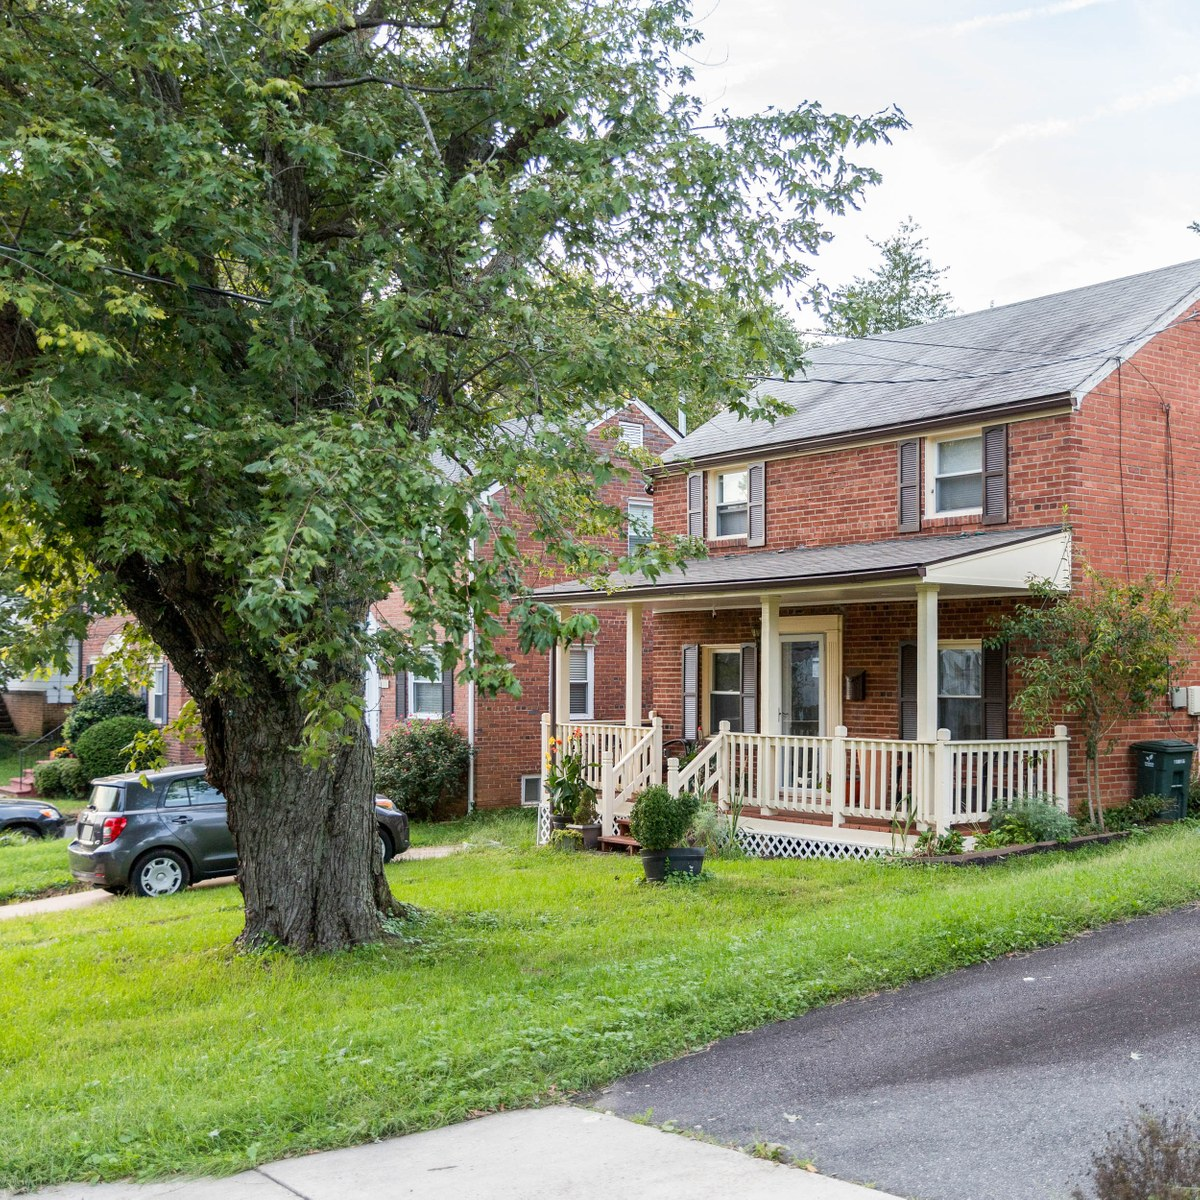 Apartments In Arlington Va No Credit Check: Bluemont, Arlington VA - Neighborhood Guide